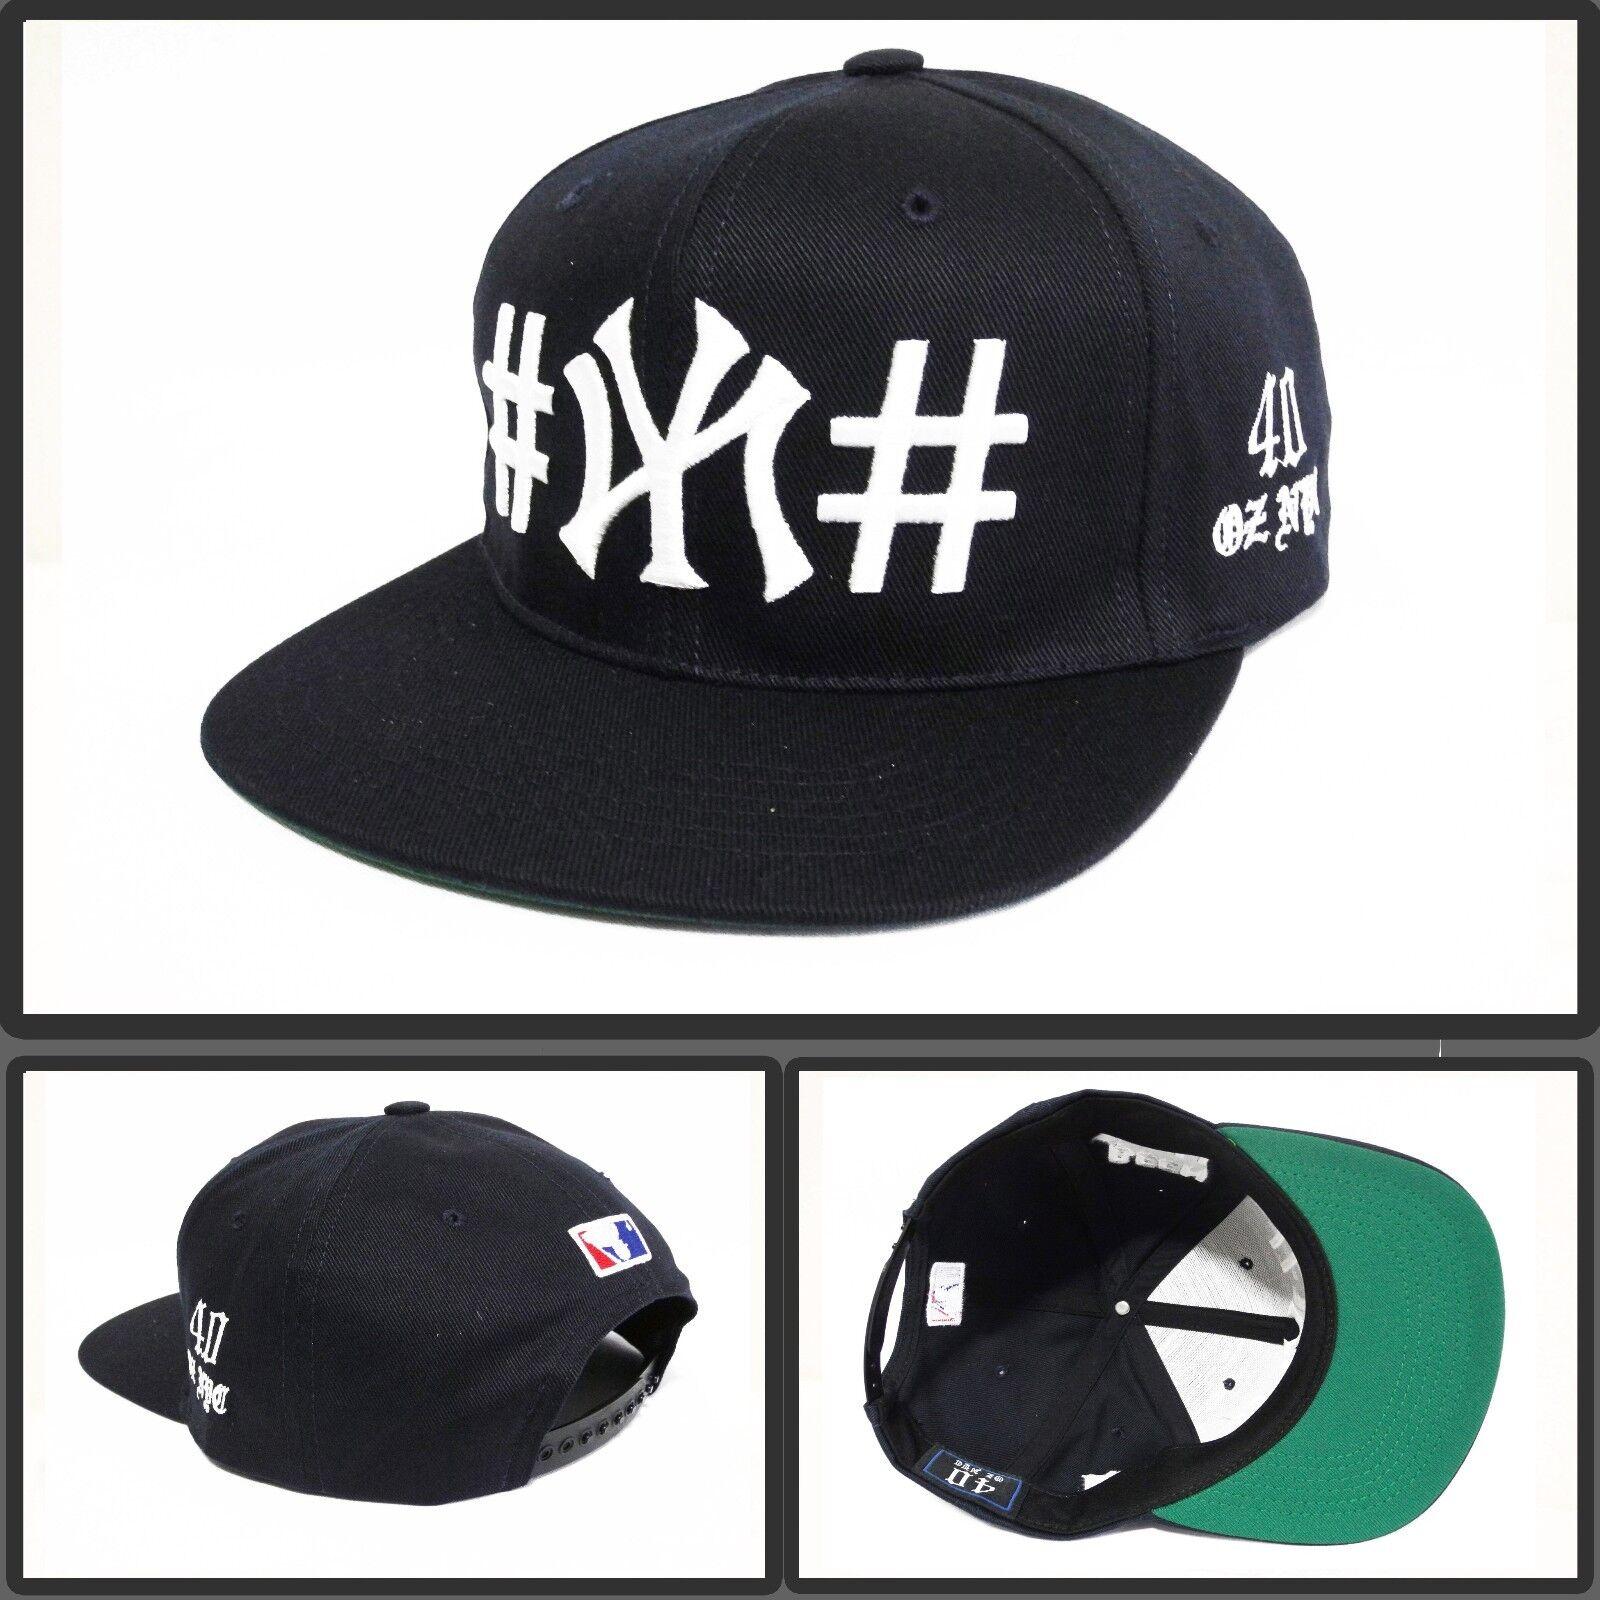 6c366e4645e Oz brand been trill van authentic cap snapback hat navy jpg 1600x1600 Been  trill hat